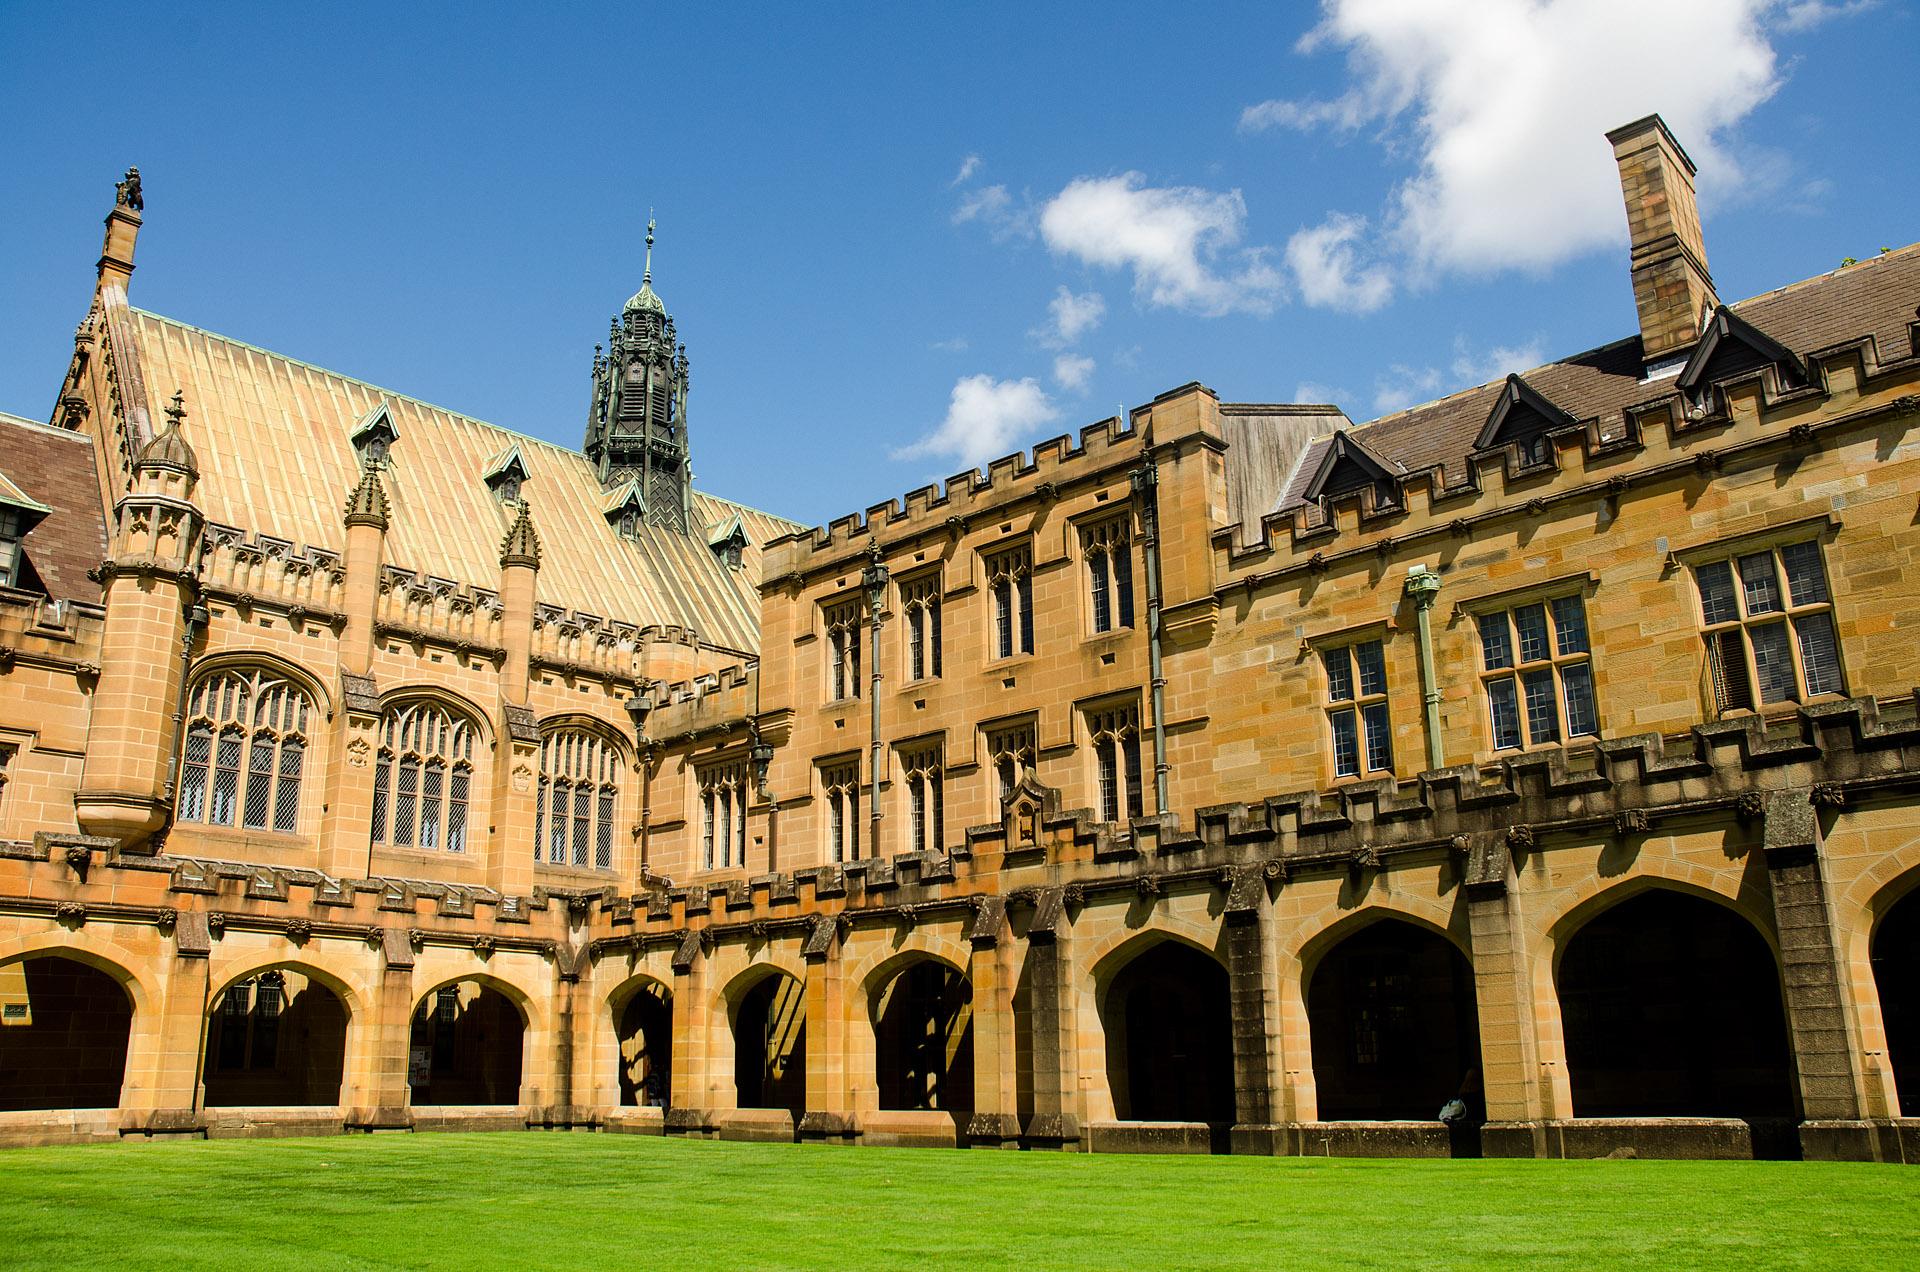 University of Sydney - Main Quadrangle